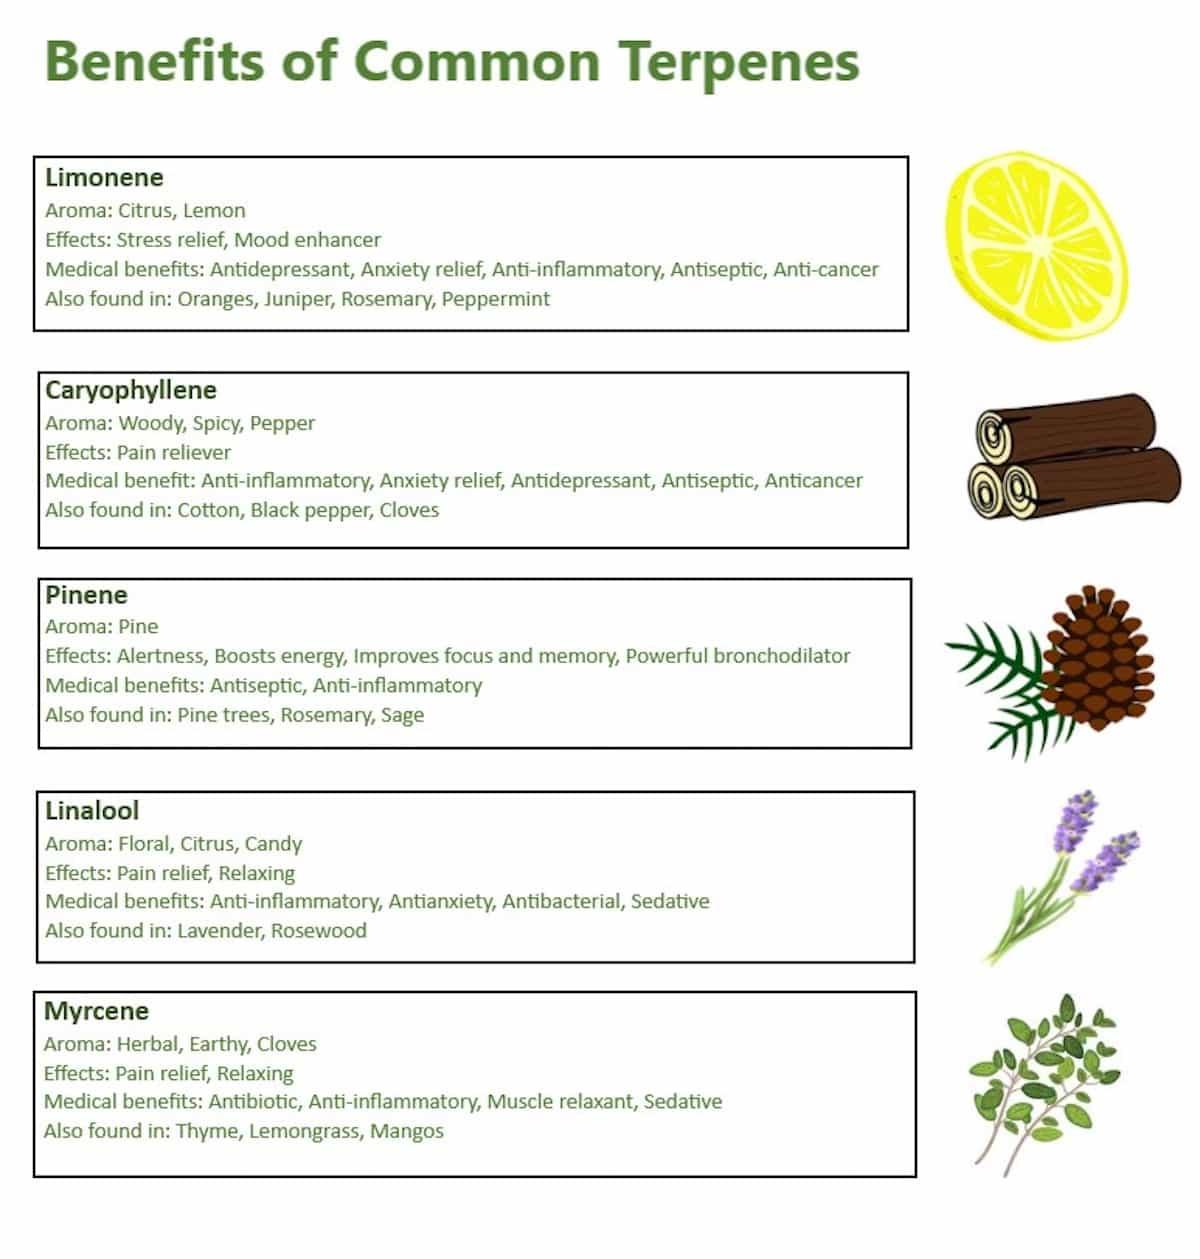 Common Terpenes